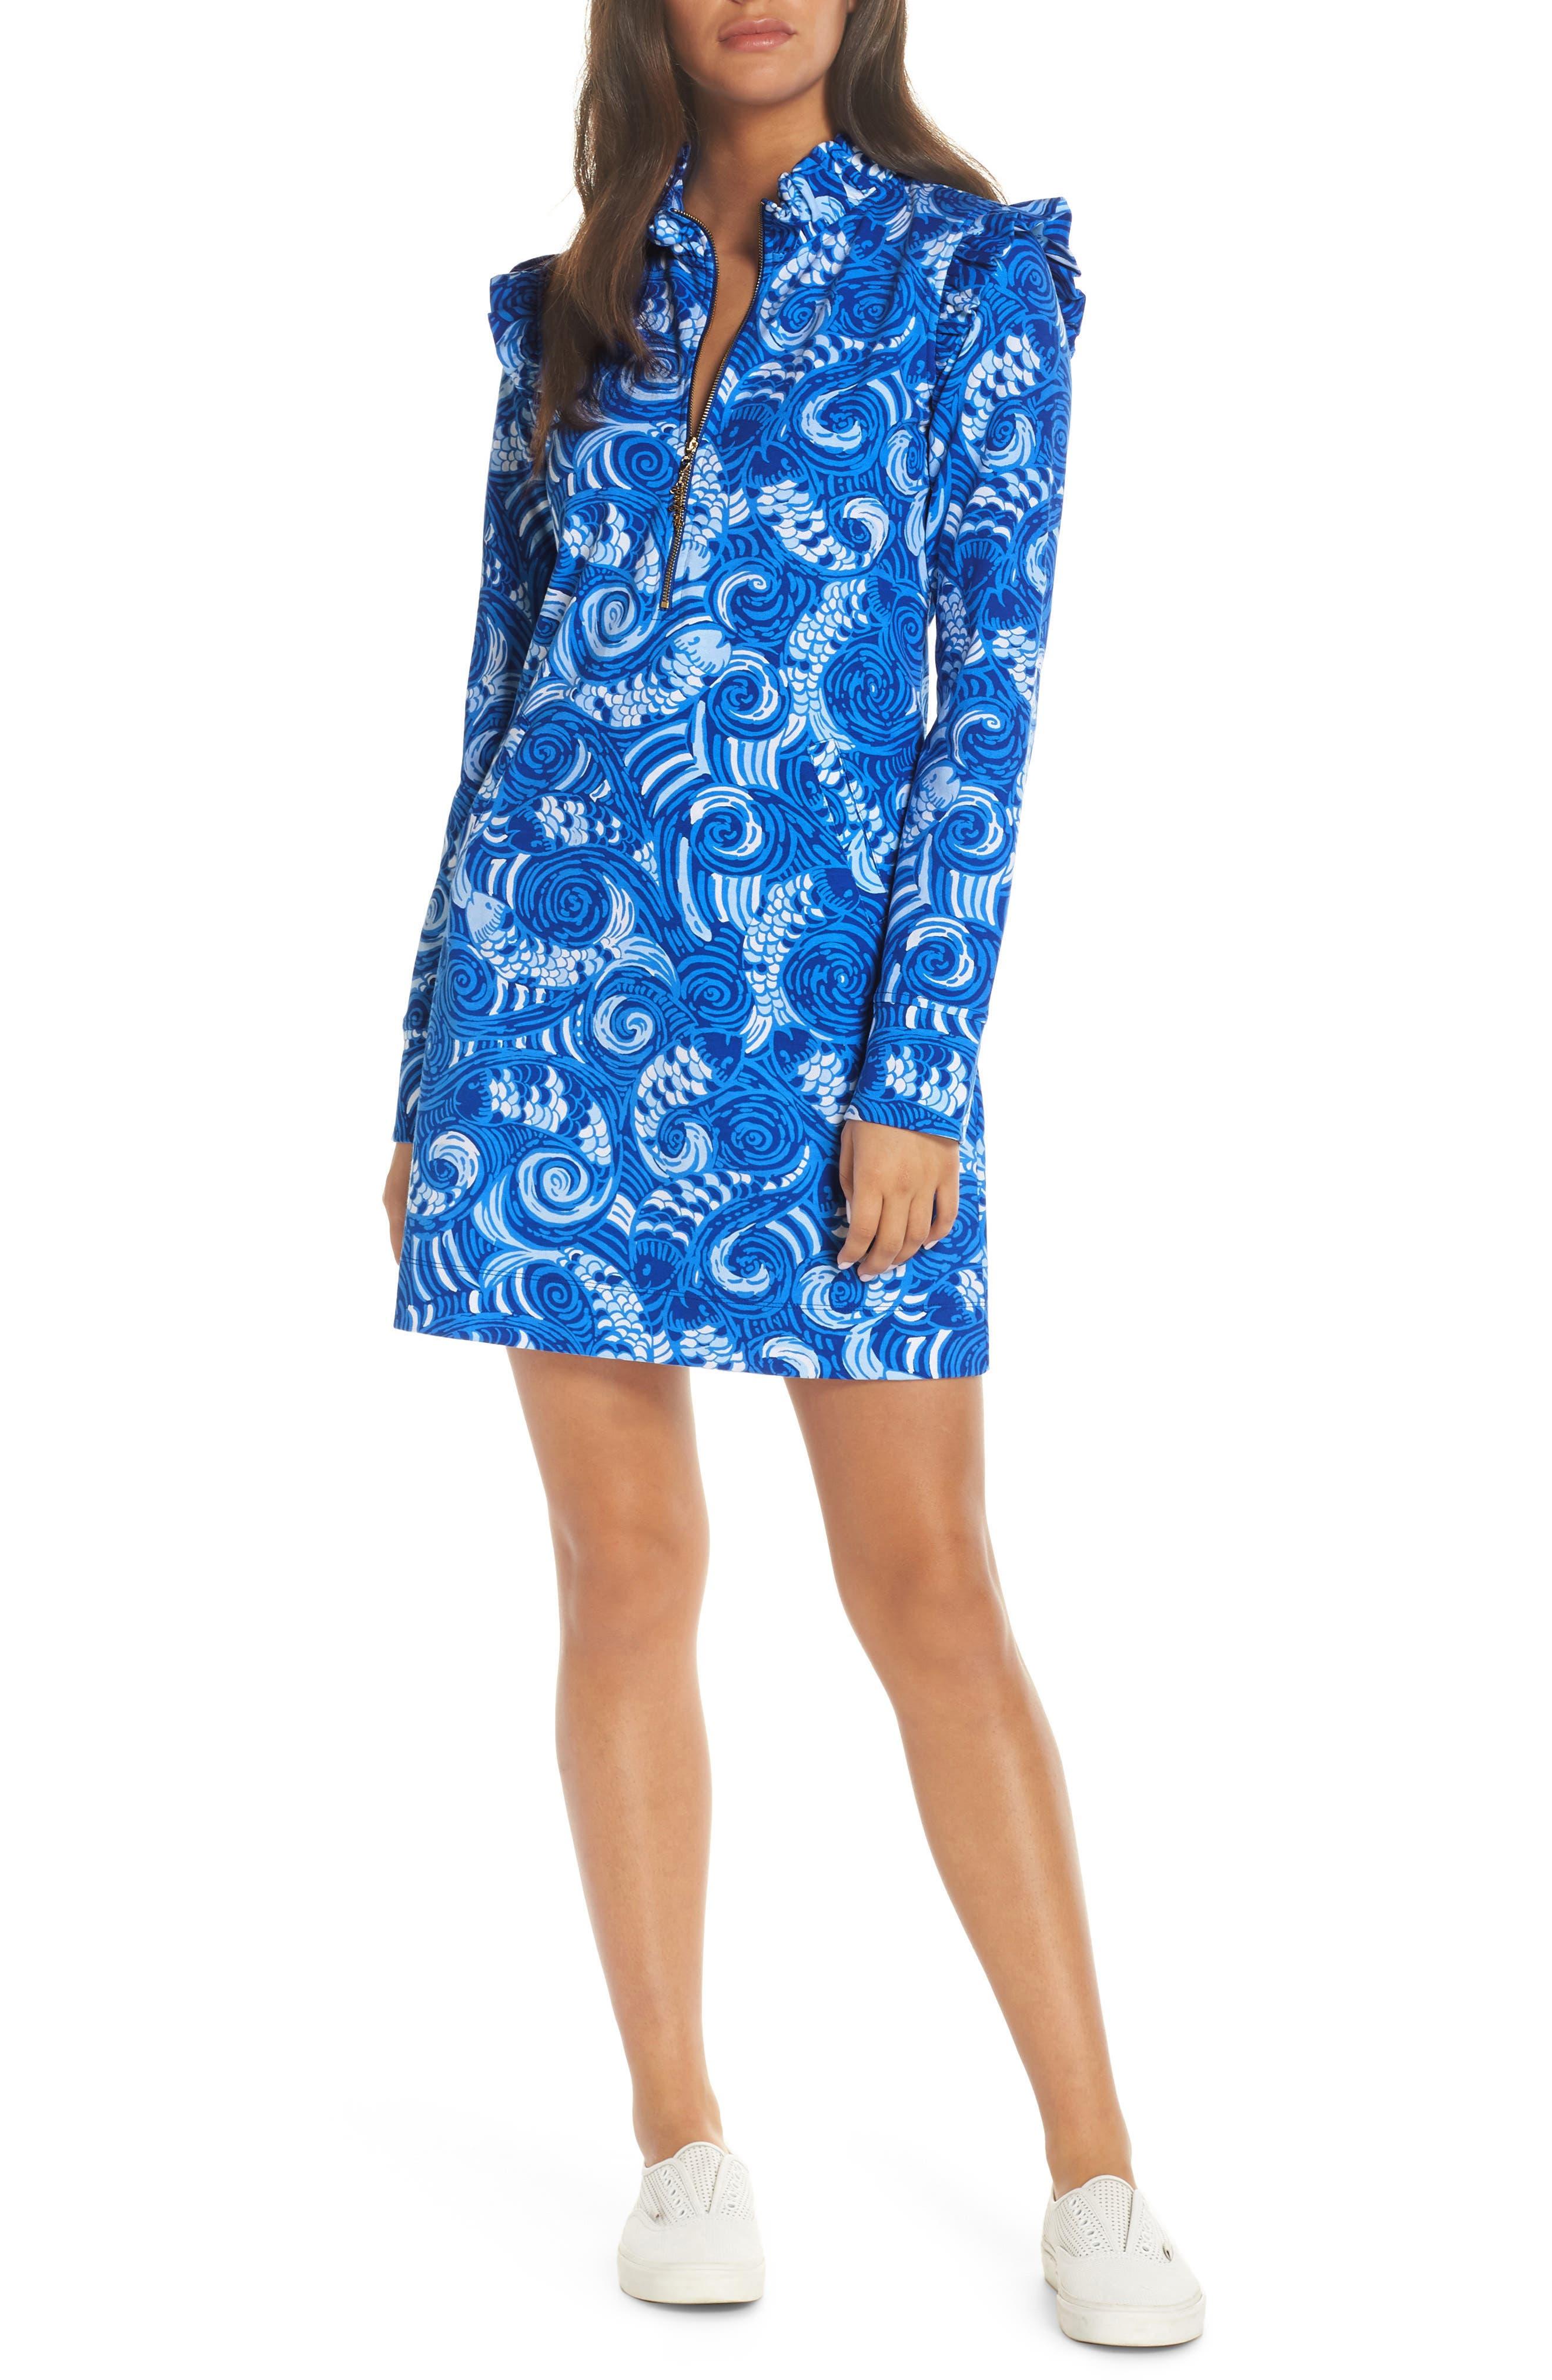 Lilly Pulitzer Skipper Upf 50+ Ruffle Shift Dress, Blue